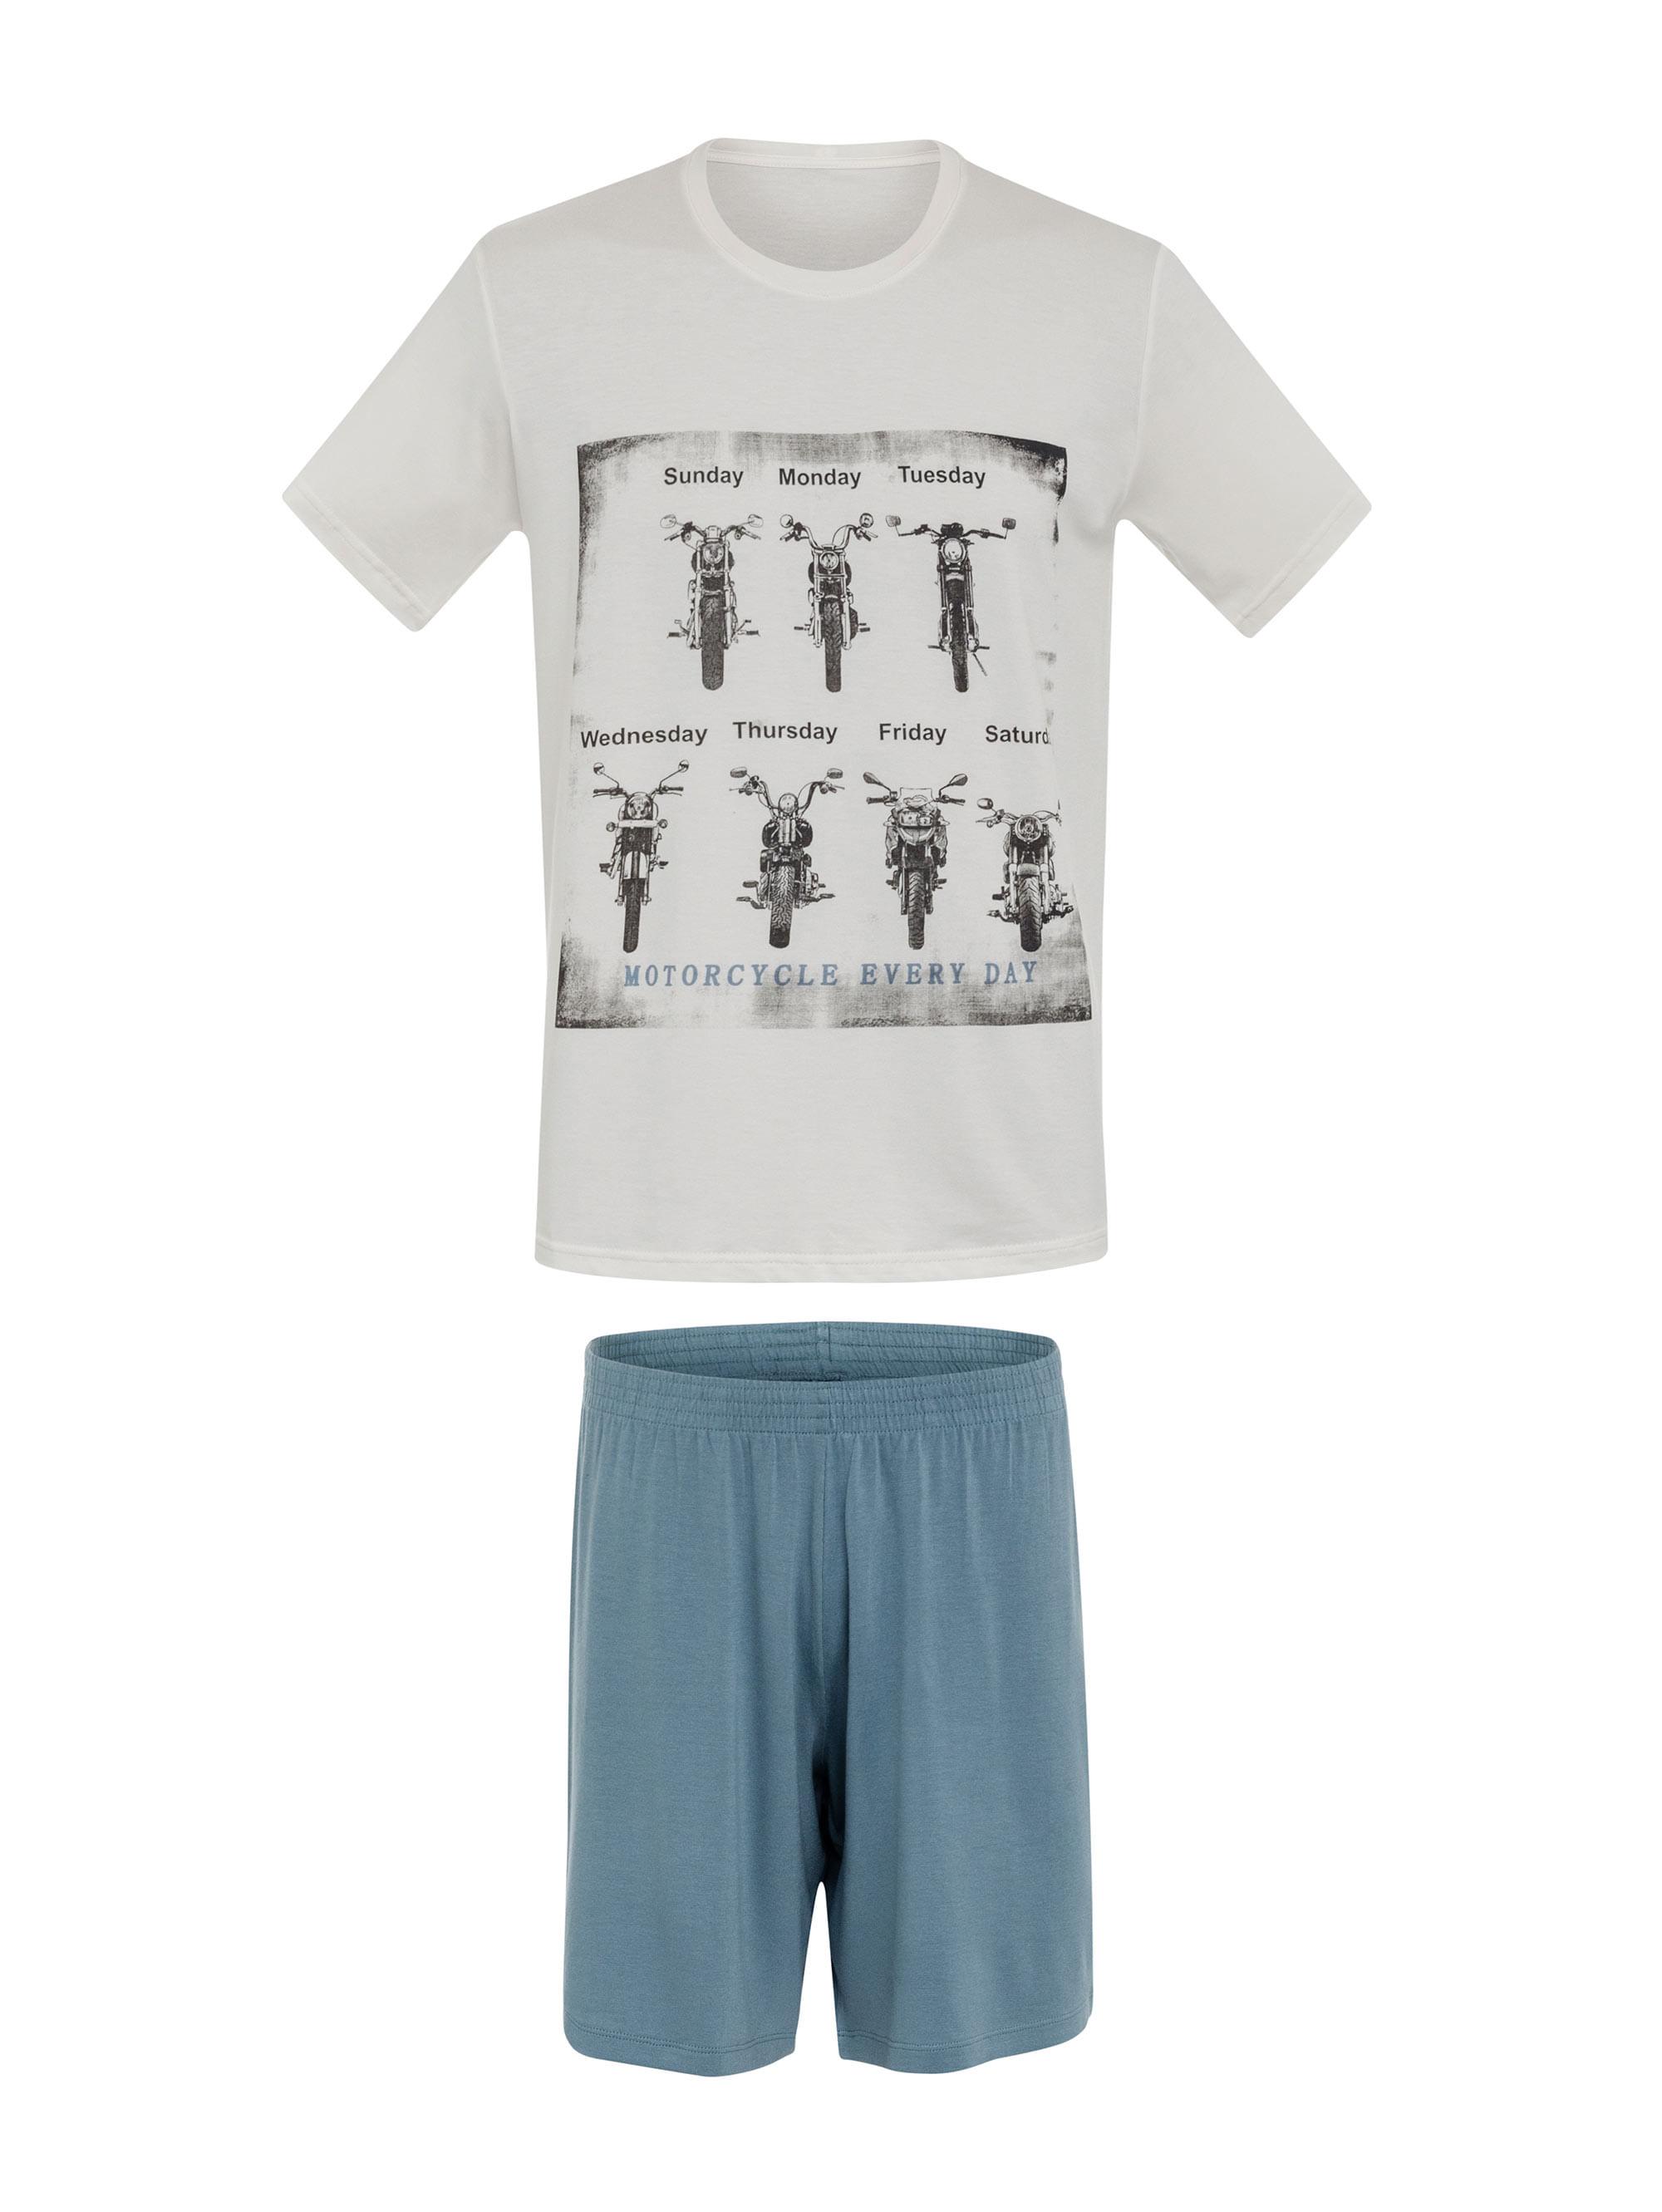 Pijama-Curto---Manga-Curta--M-MONZA-OUT---04.02.0778